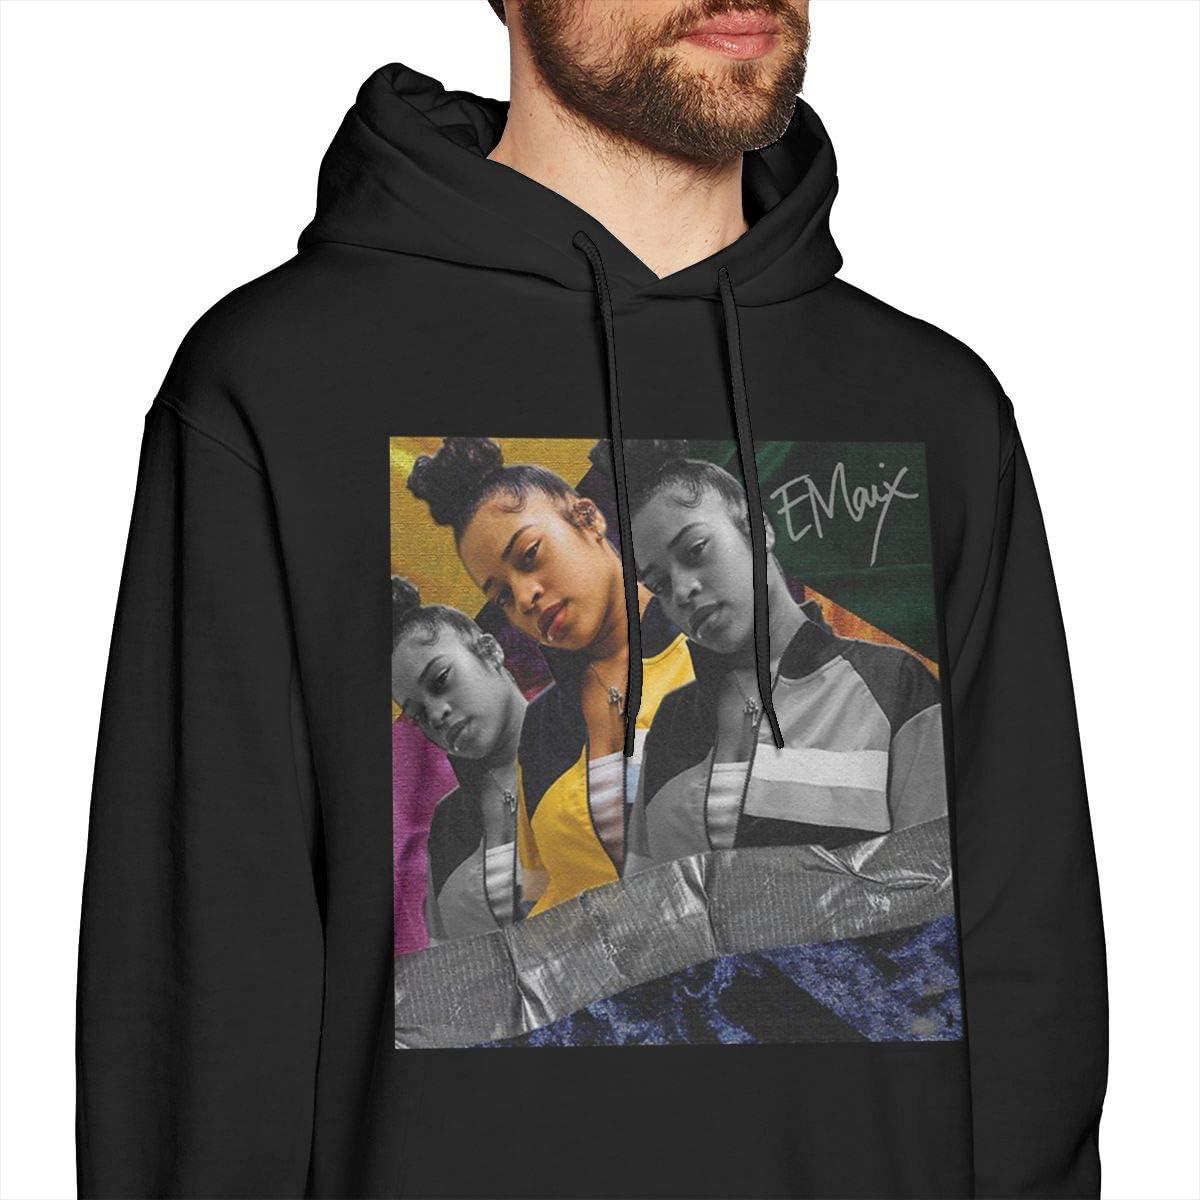 SKFUKS Mens Hoodie Sweatshirt Inquisitor-Master Sweater Black